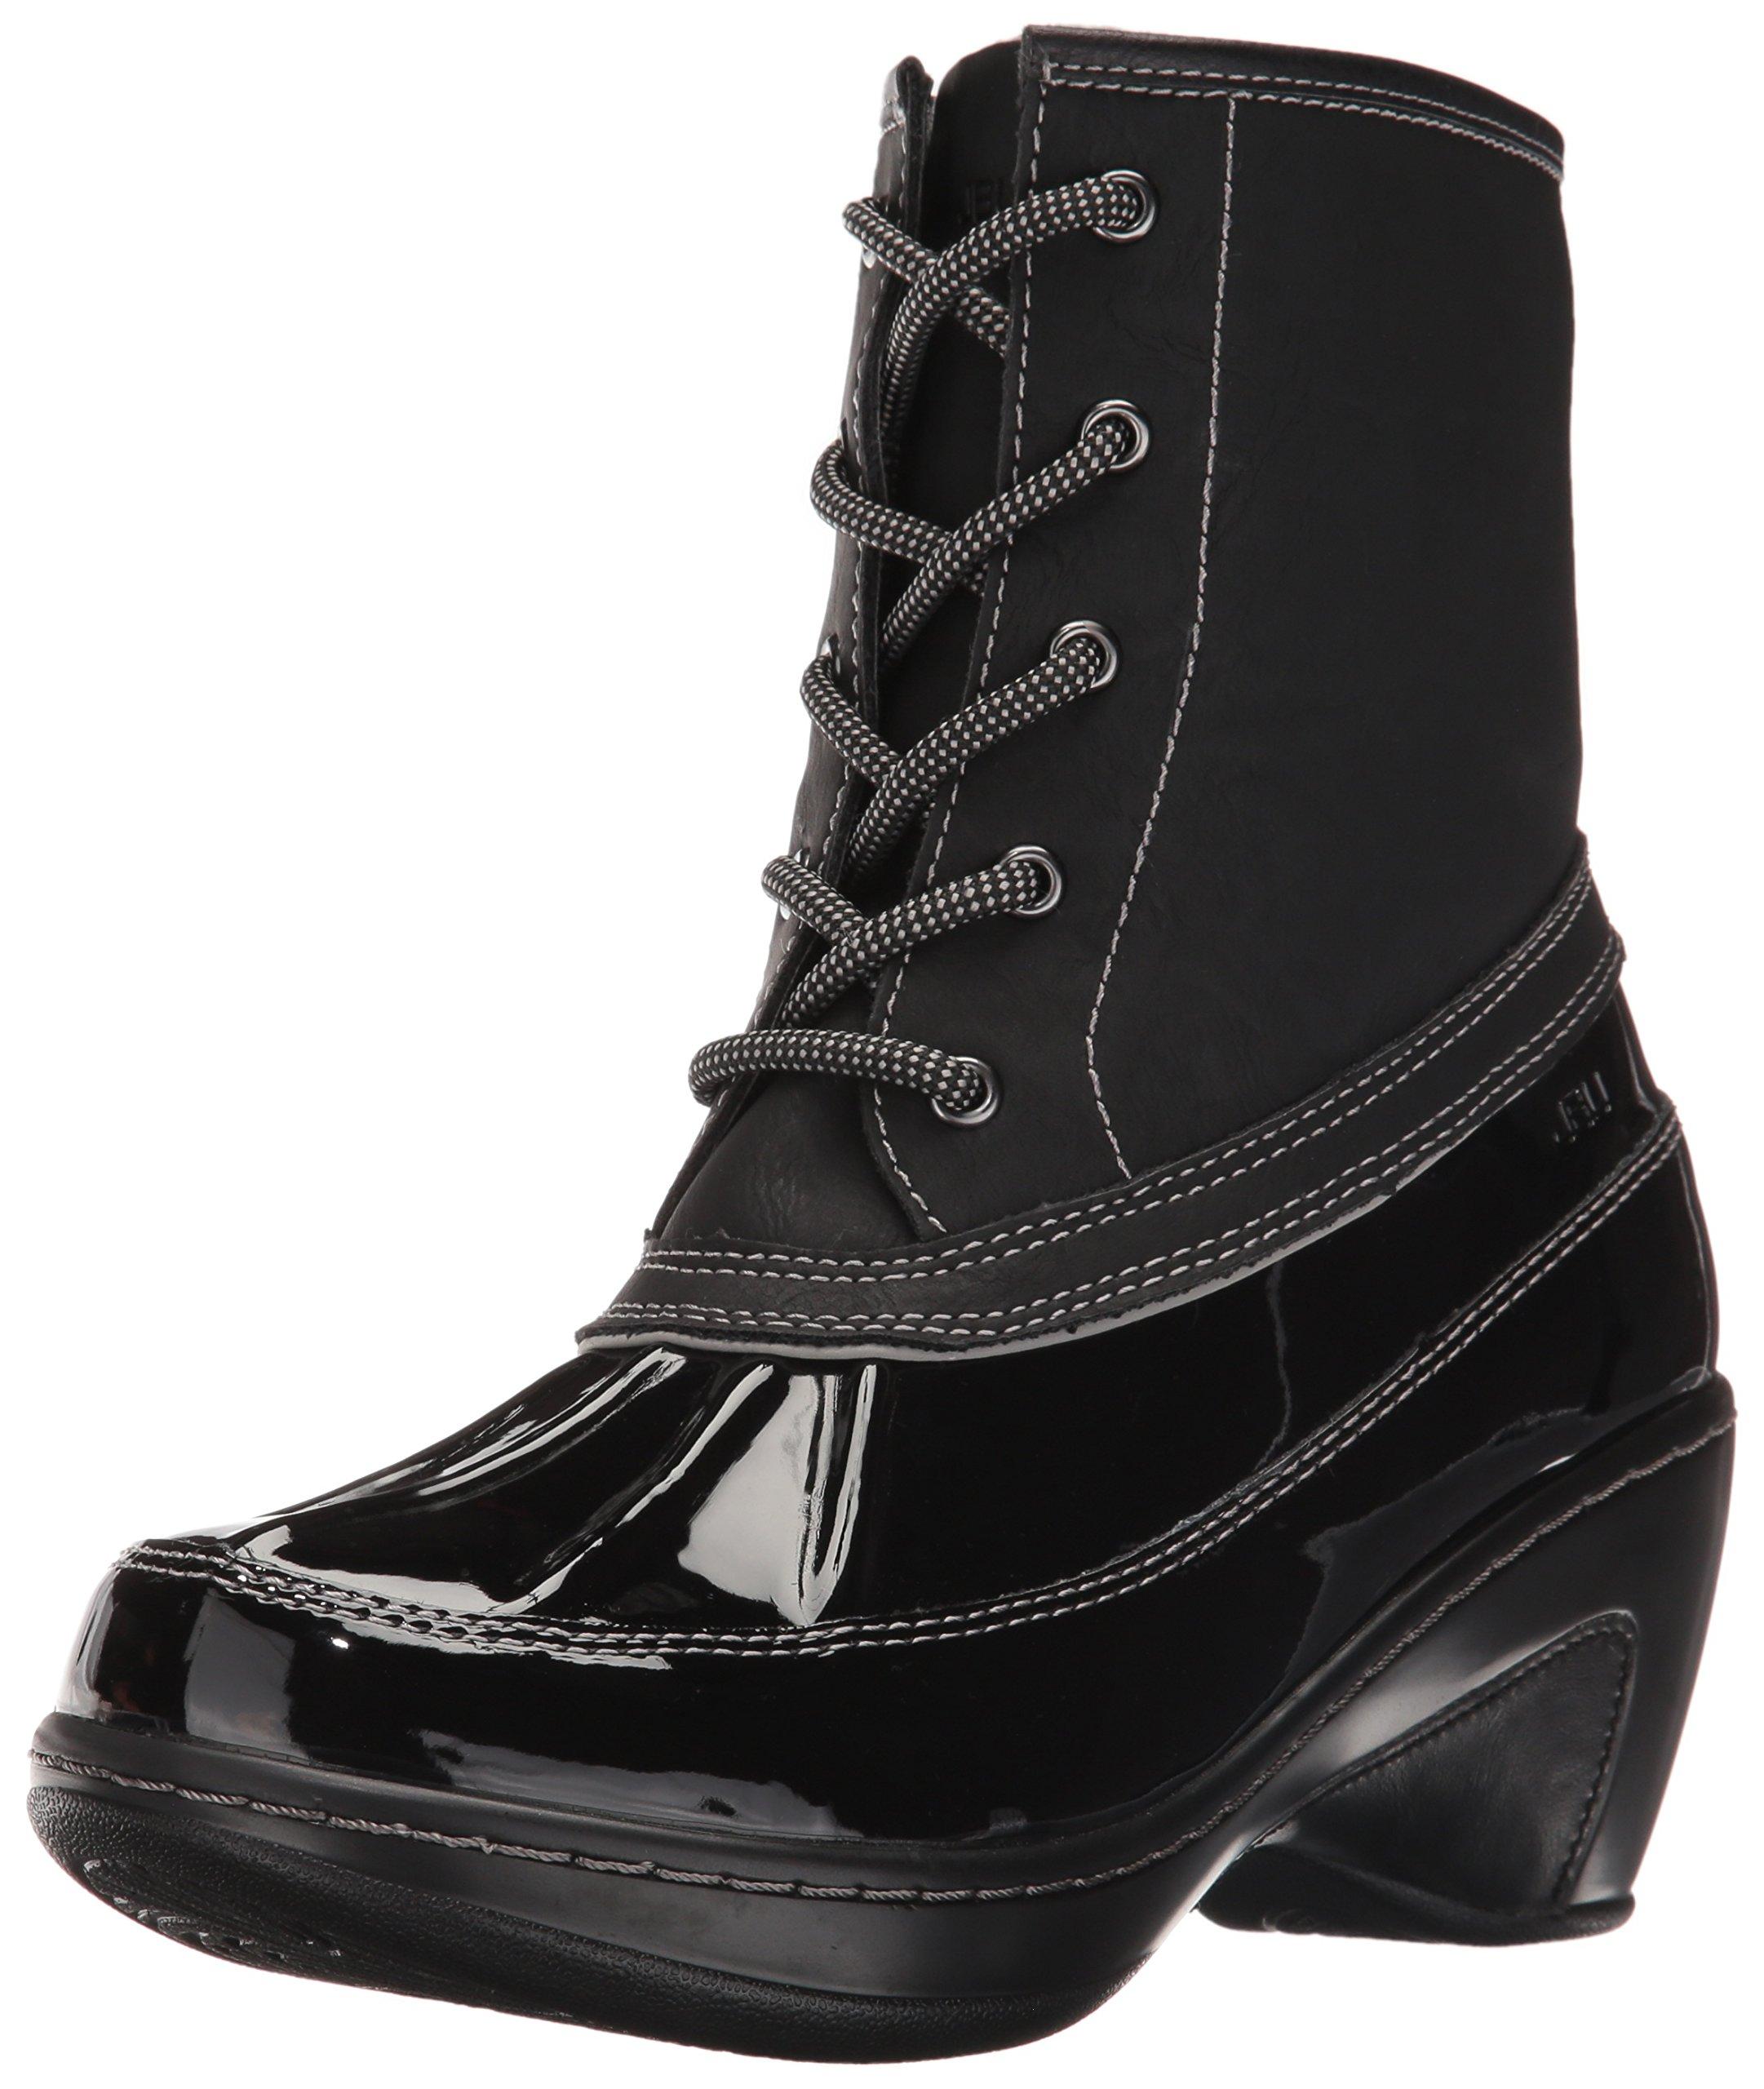 JBU by Jambu Women's Caramel Rain Boot, Black, 10 M US